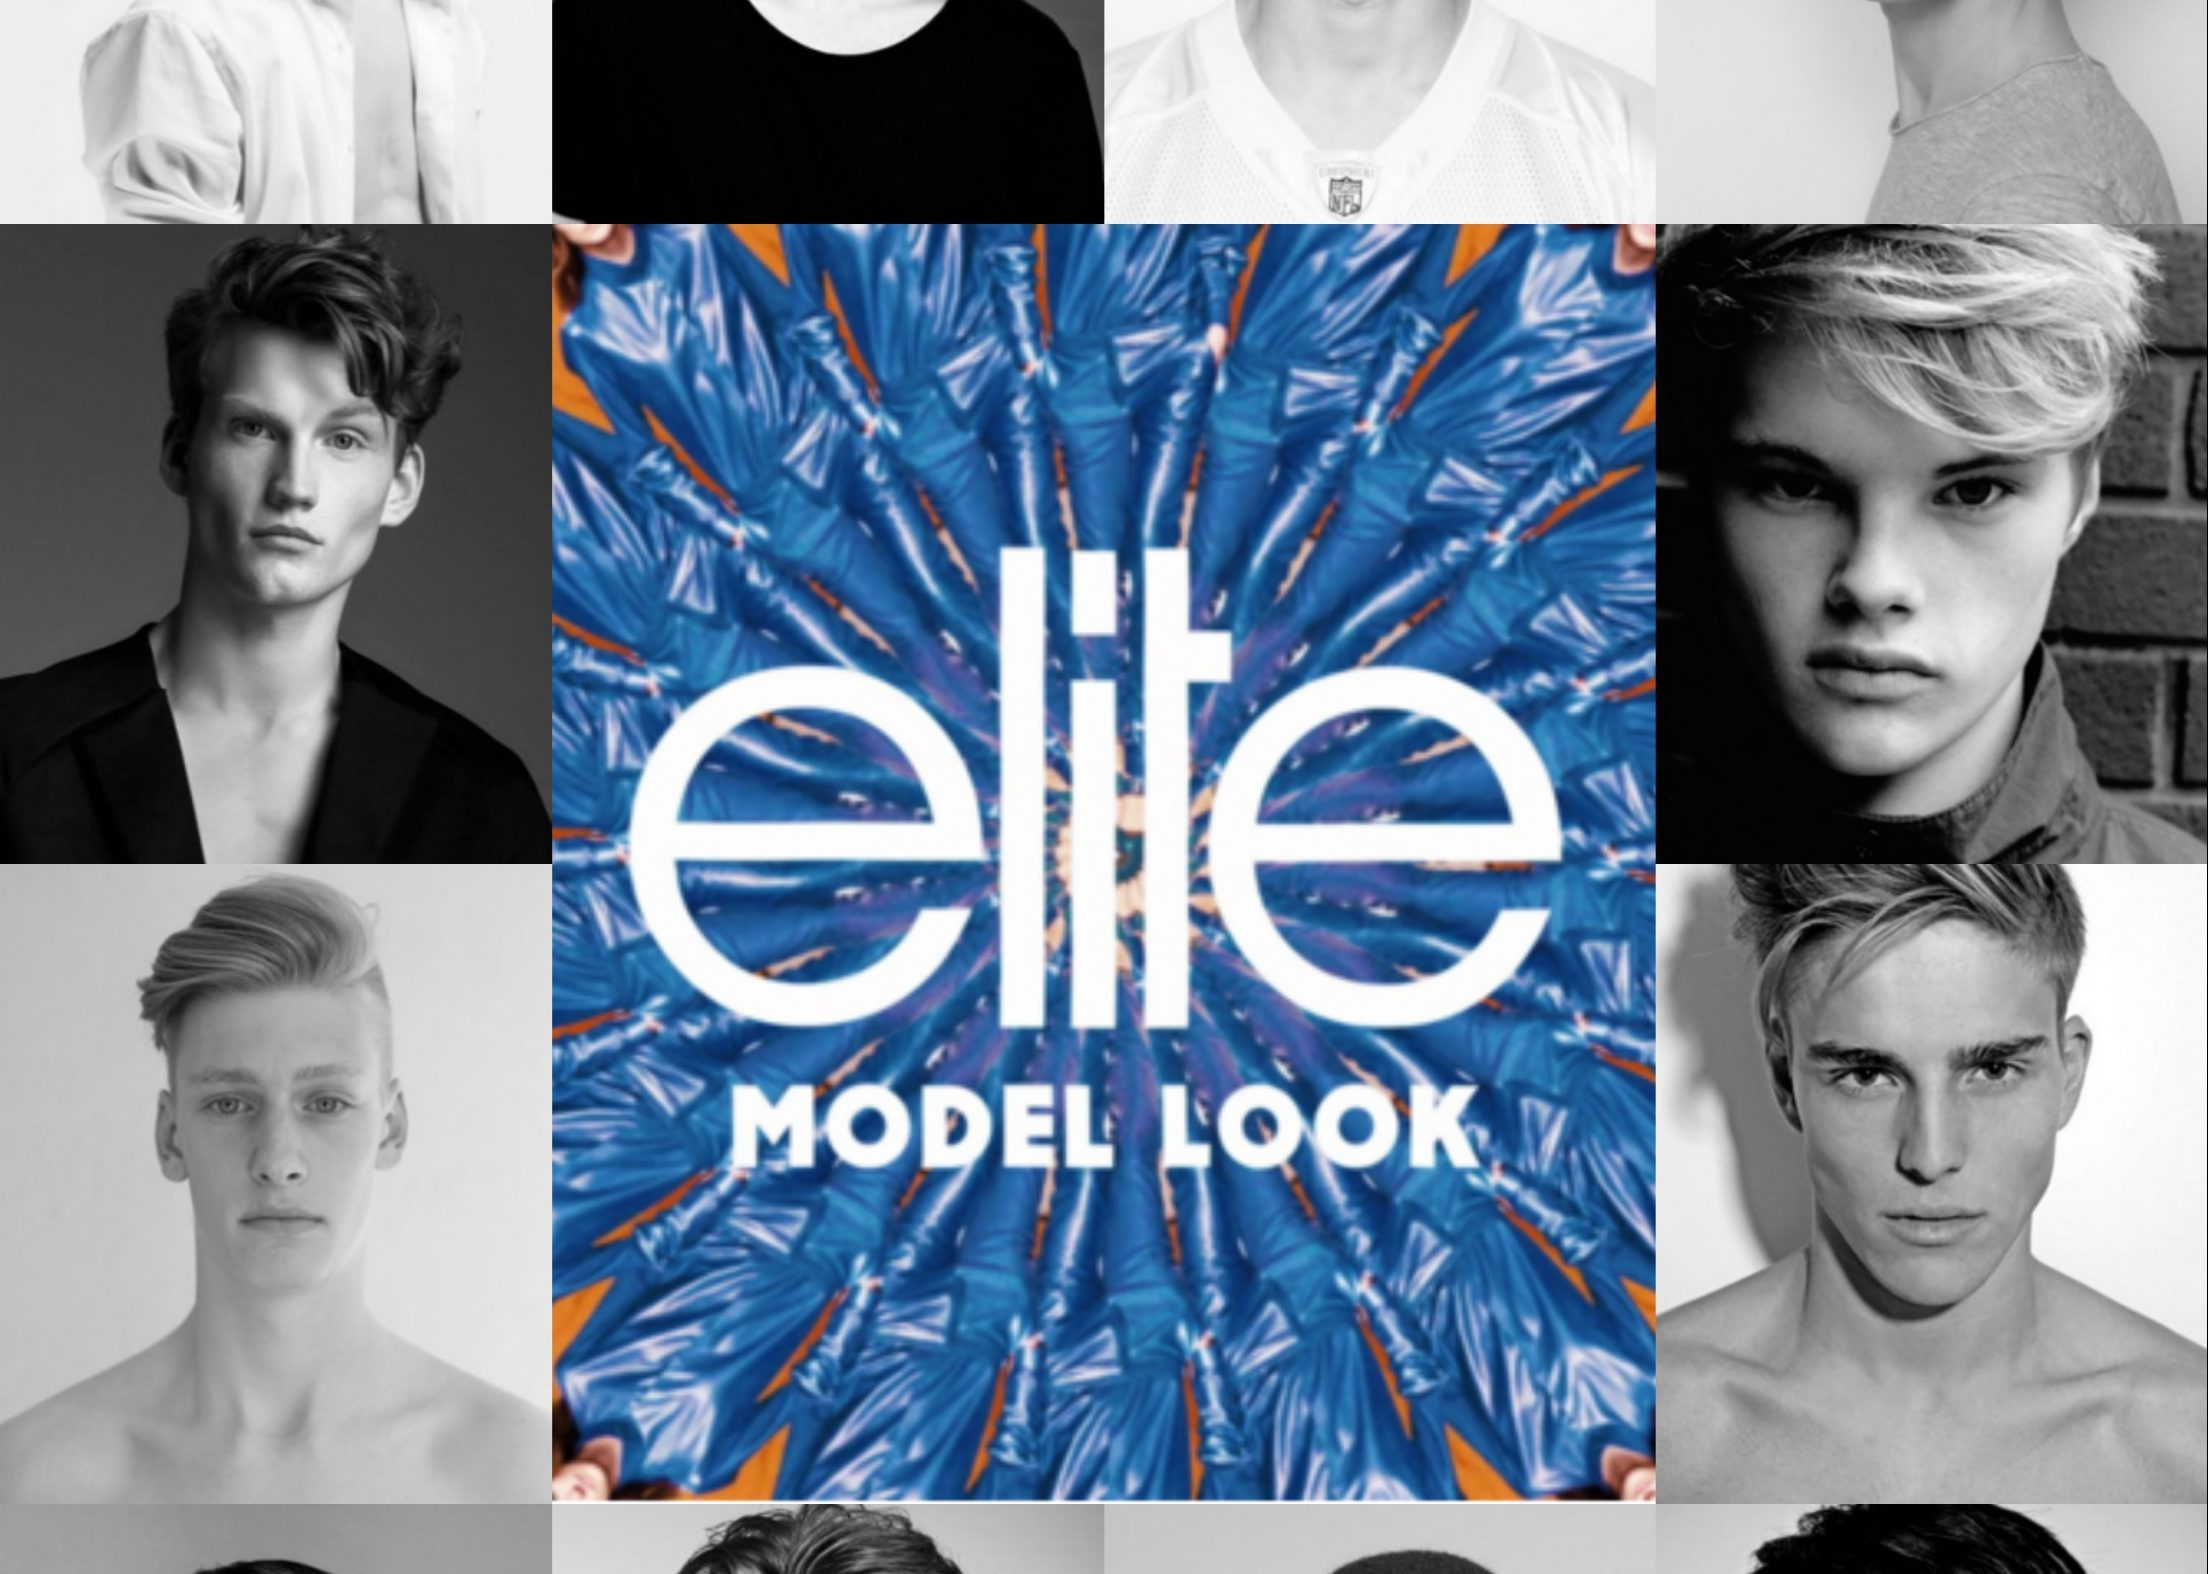 The Elite Model Look World Final 2015 : The Contestants The Elite Model Look World Final 2015 : The Contestants Vanity Teen 虚荣青年 Menswear & new faces magazine